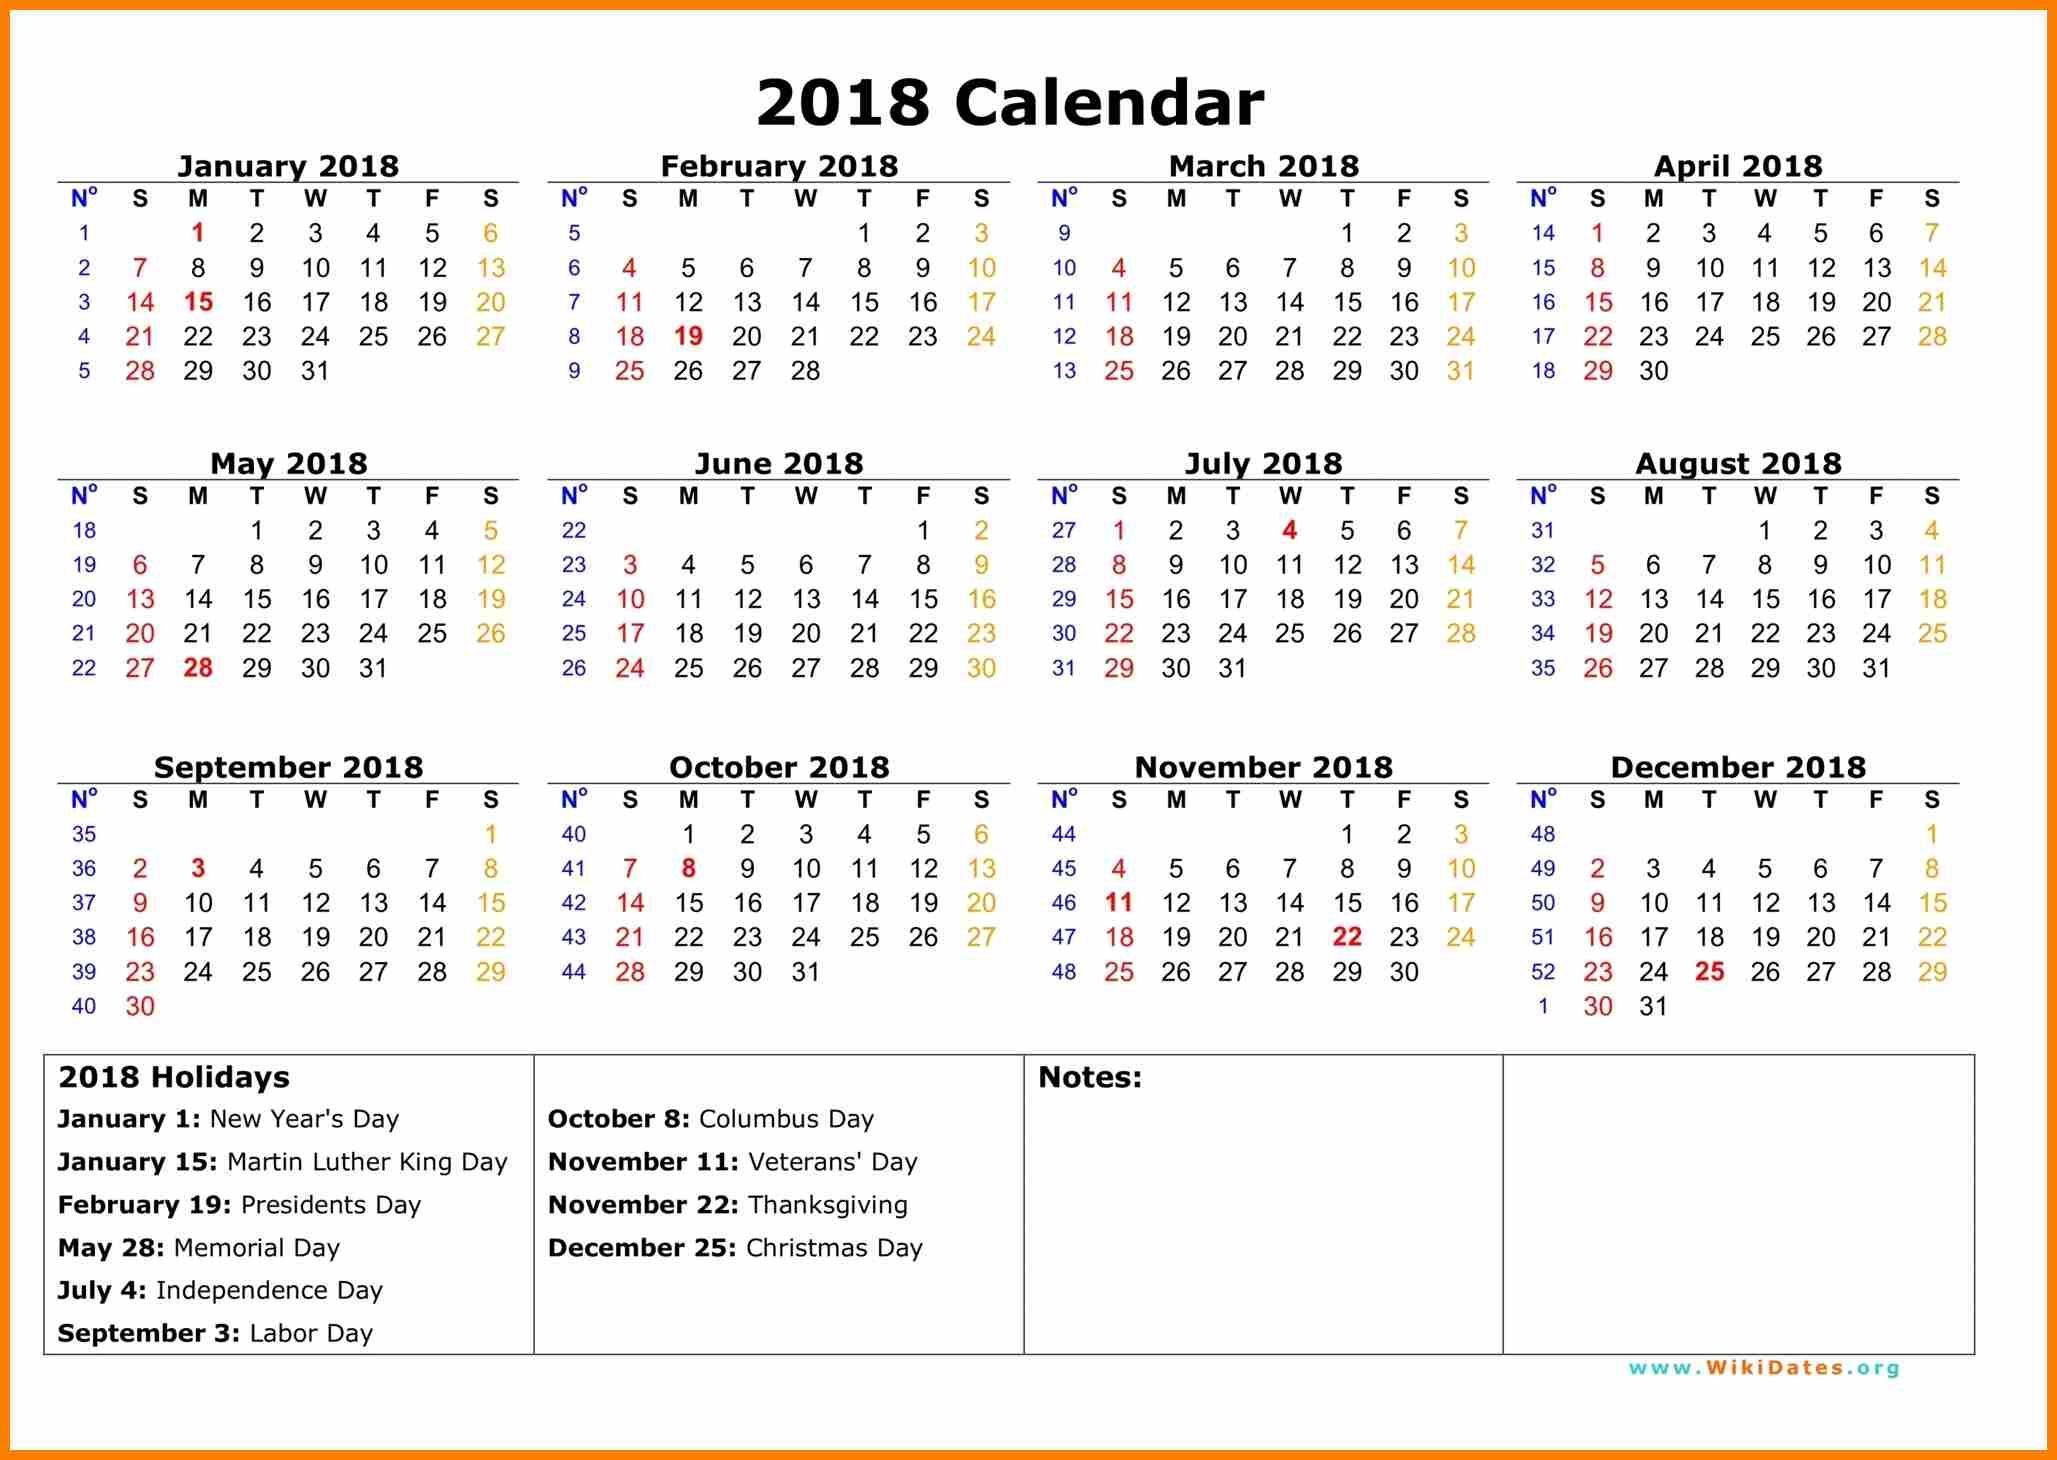 2012 calendar india with holidays and festivals pdf